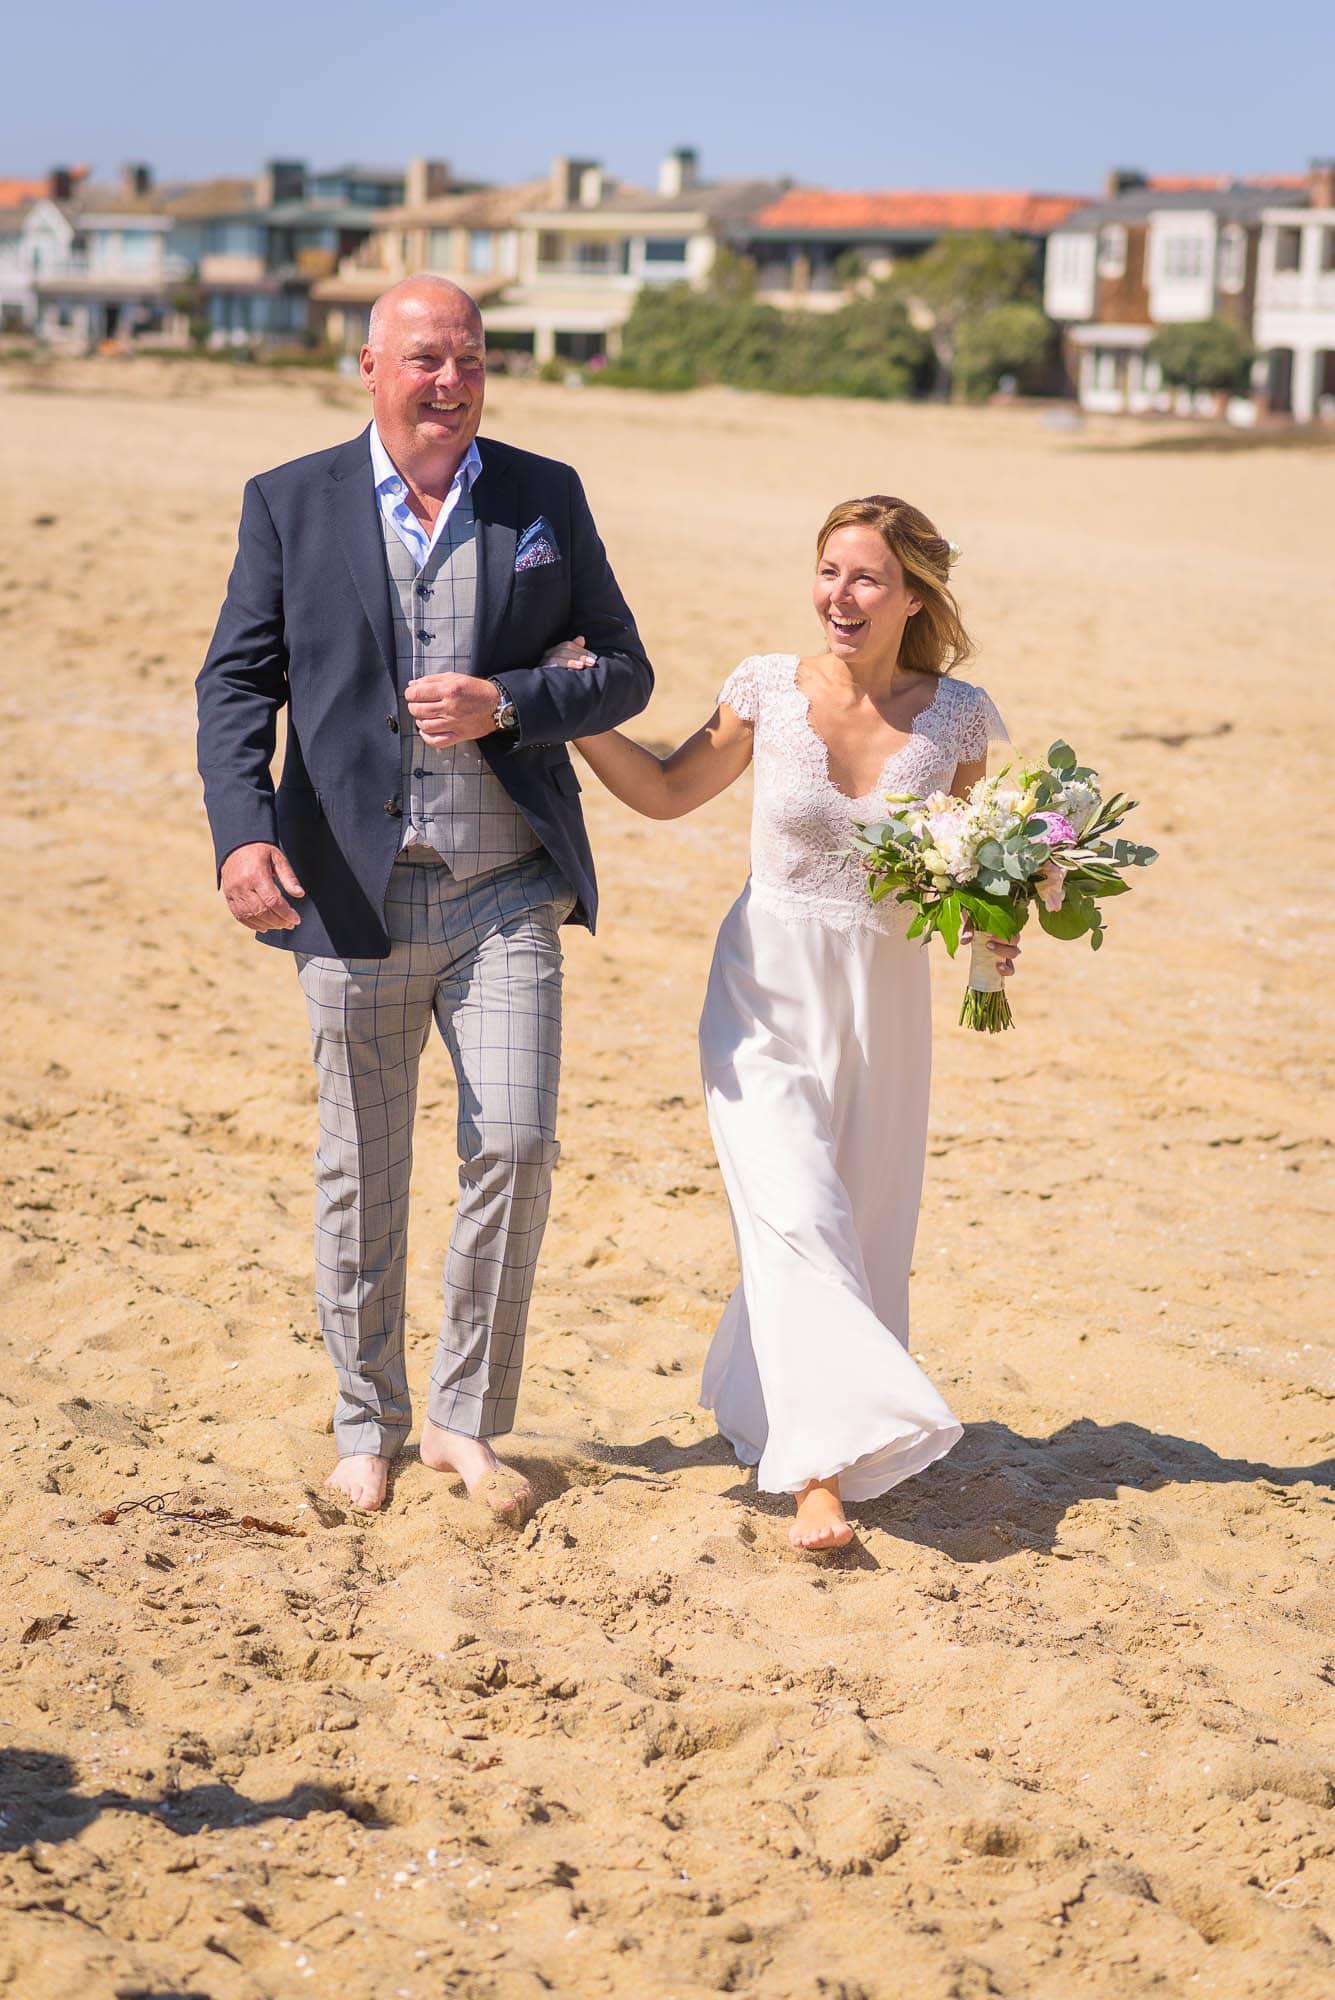 018_Alan_and_Heidi_Wedding_Verena_Andreas